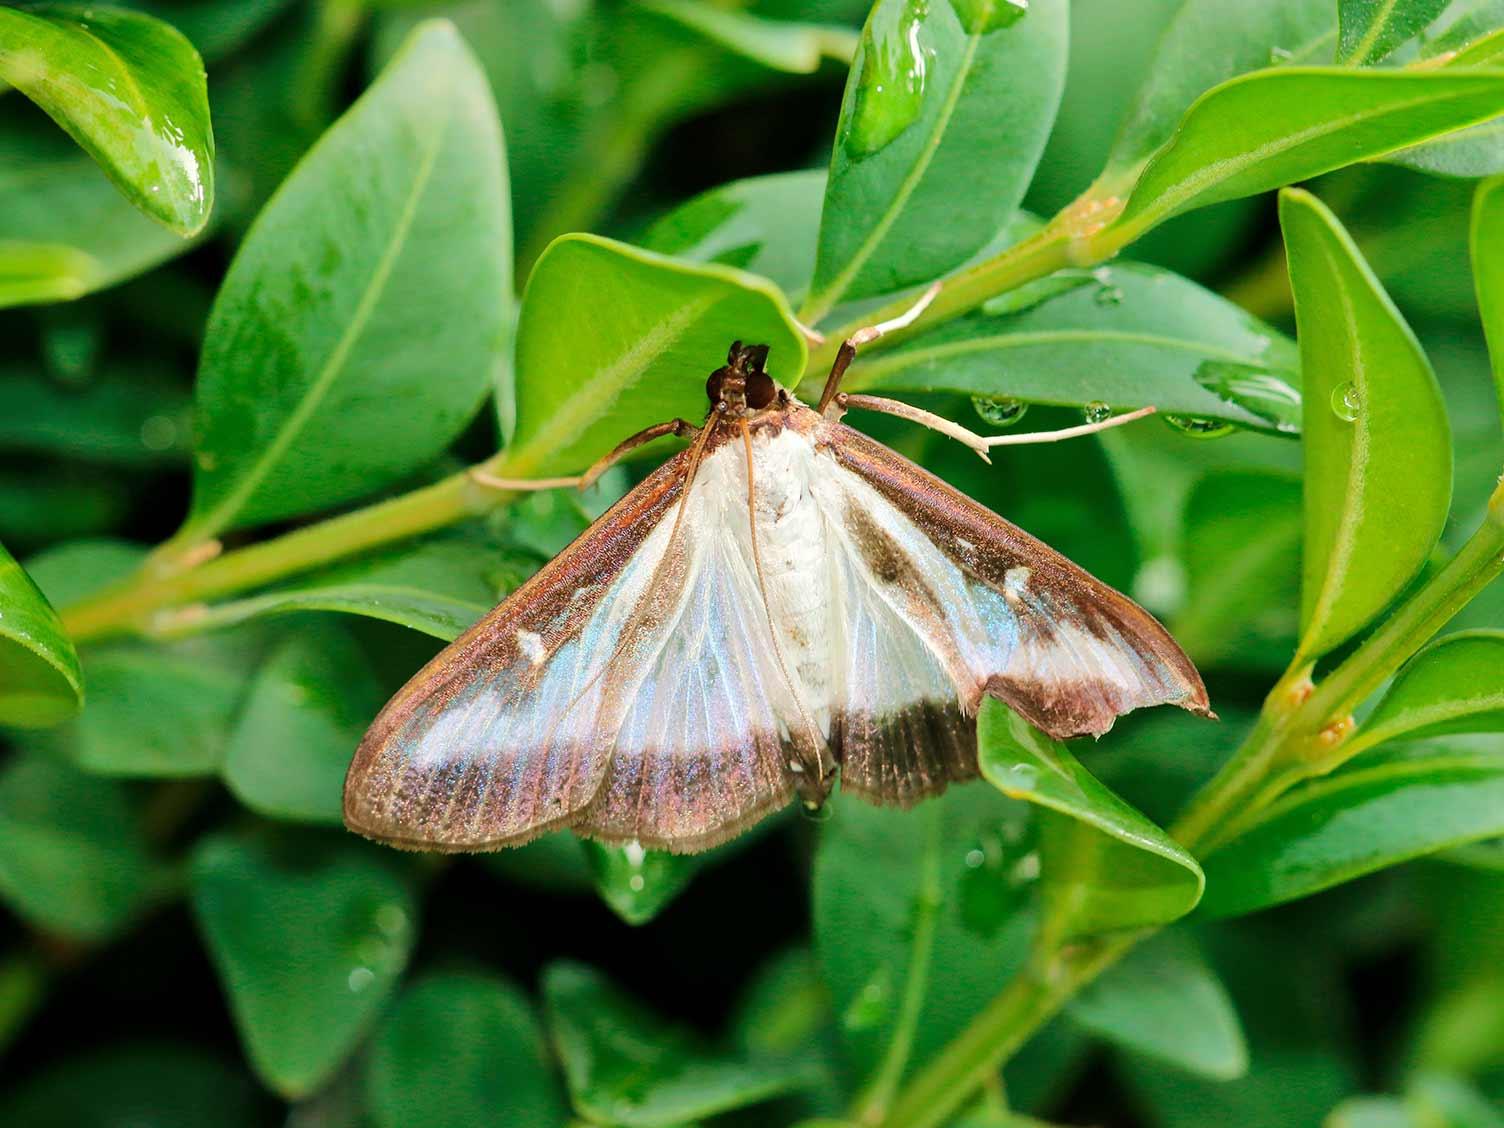 Box tree caterpillar - treatment and control | lovethegarden